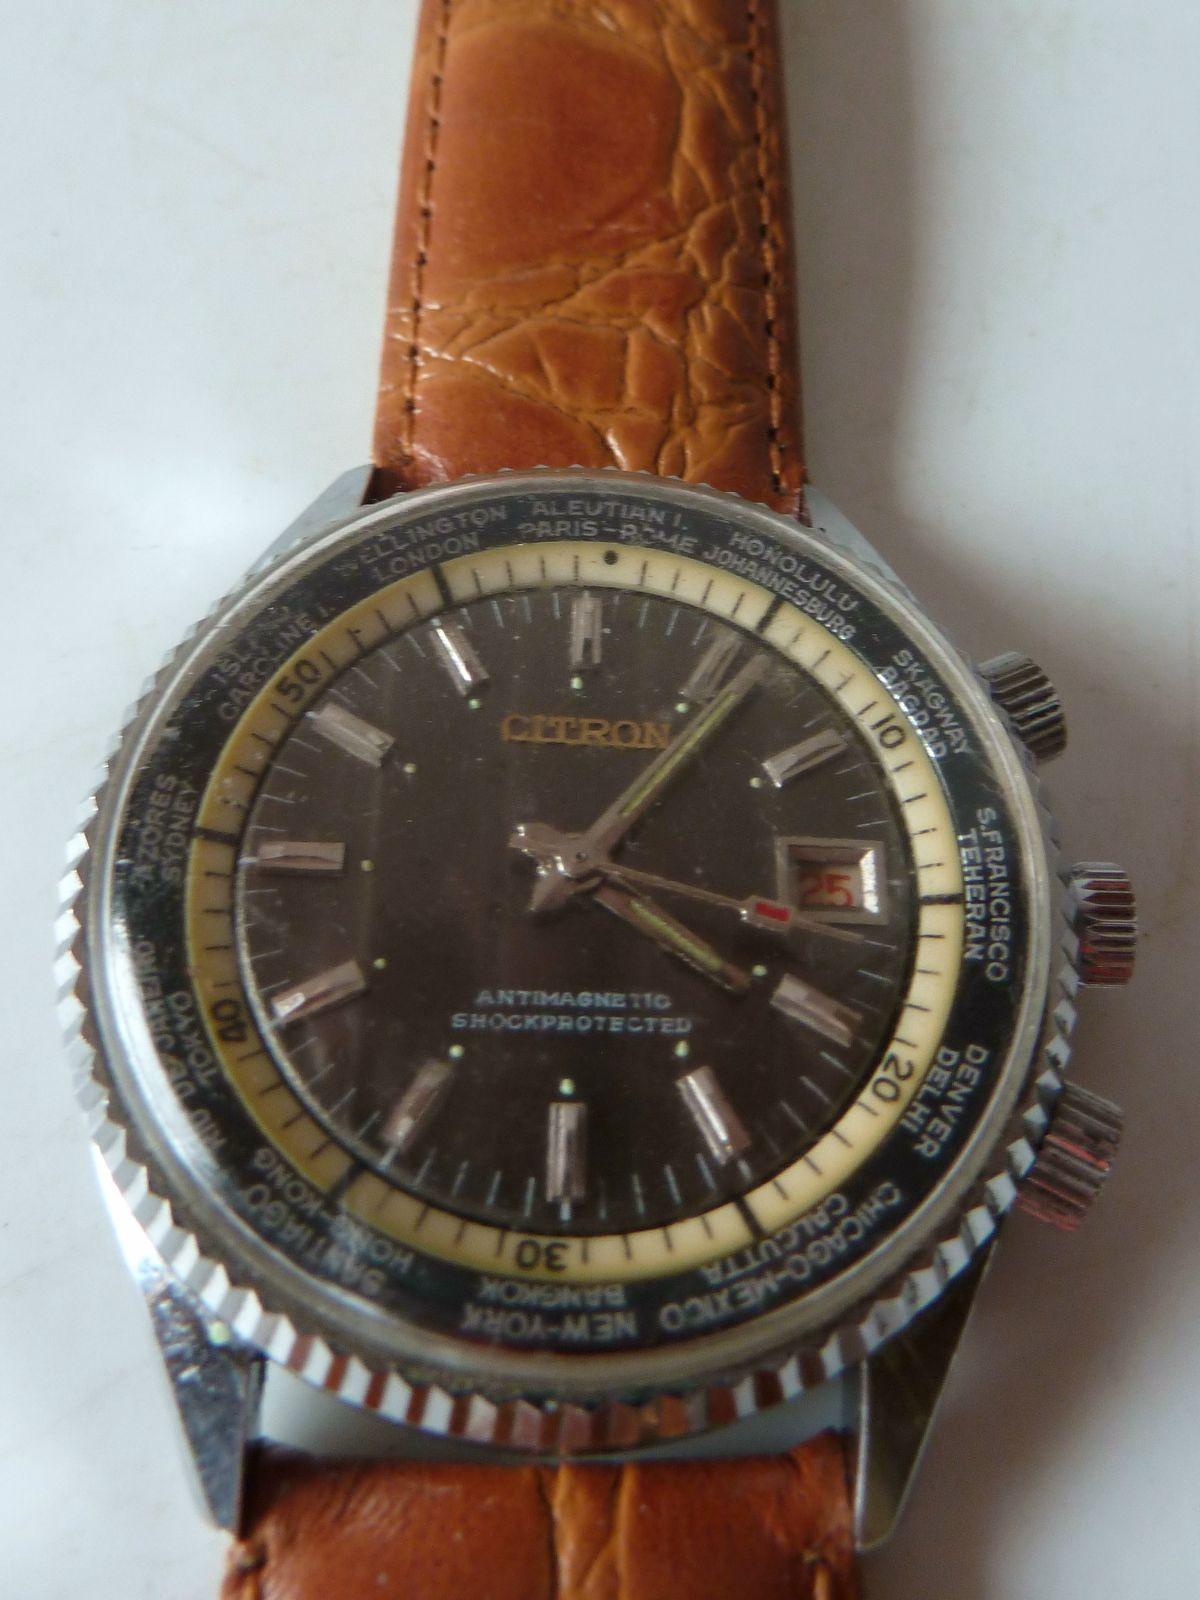 Seiko 5 Automatic Military Jam Tangan Pria Hitam Stainless Steel Sport Ssa299k1 Otomatis Hijau Putih Vintage Citron World Timer Magnetic Compass